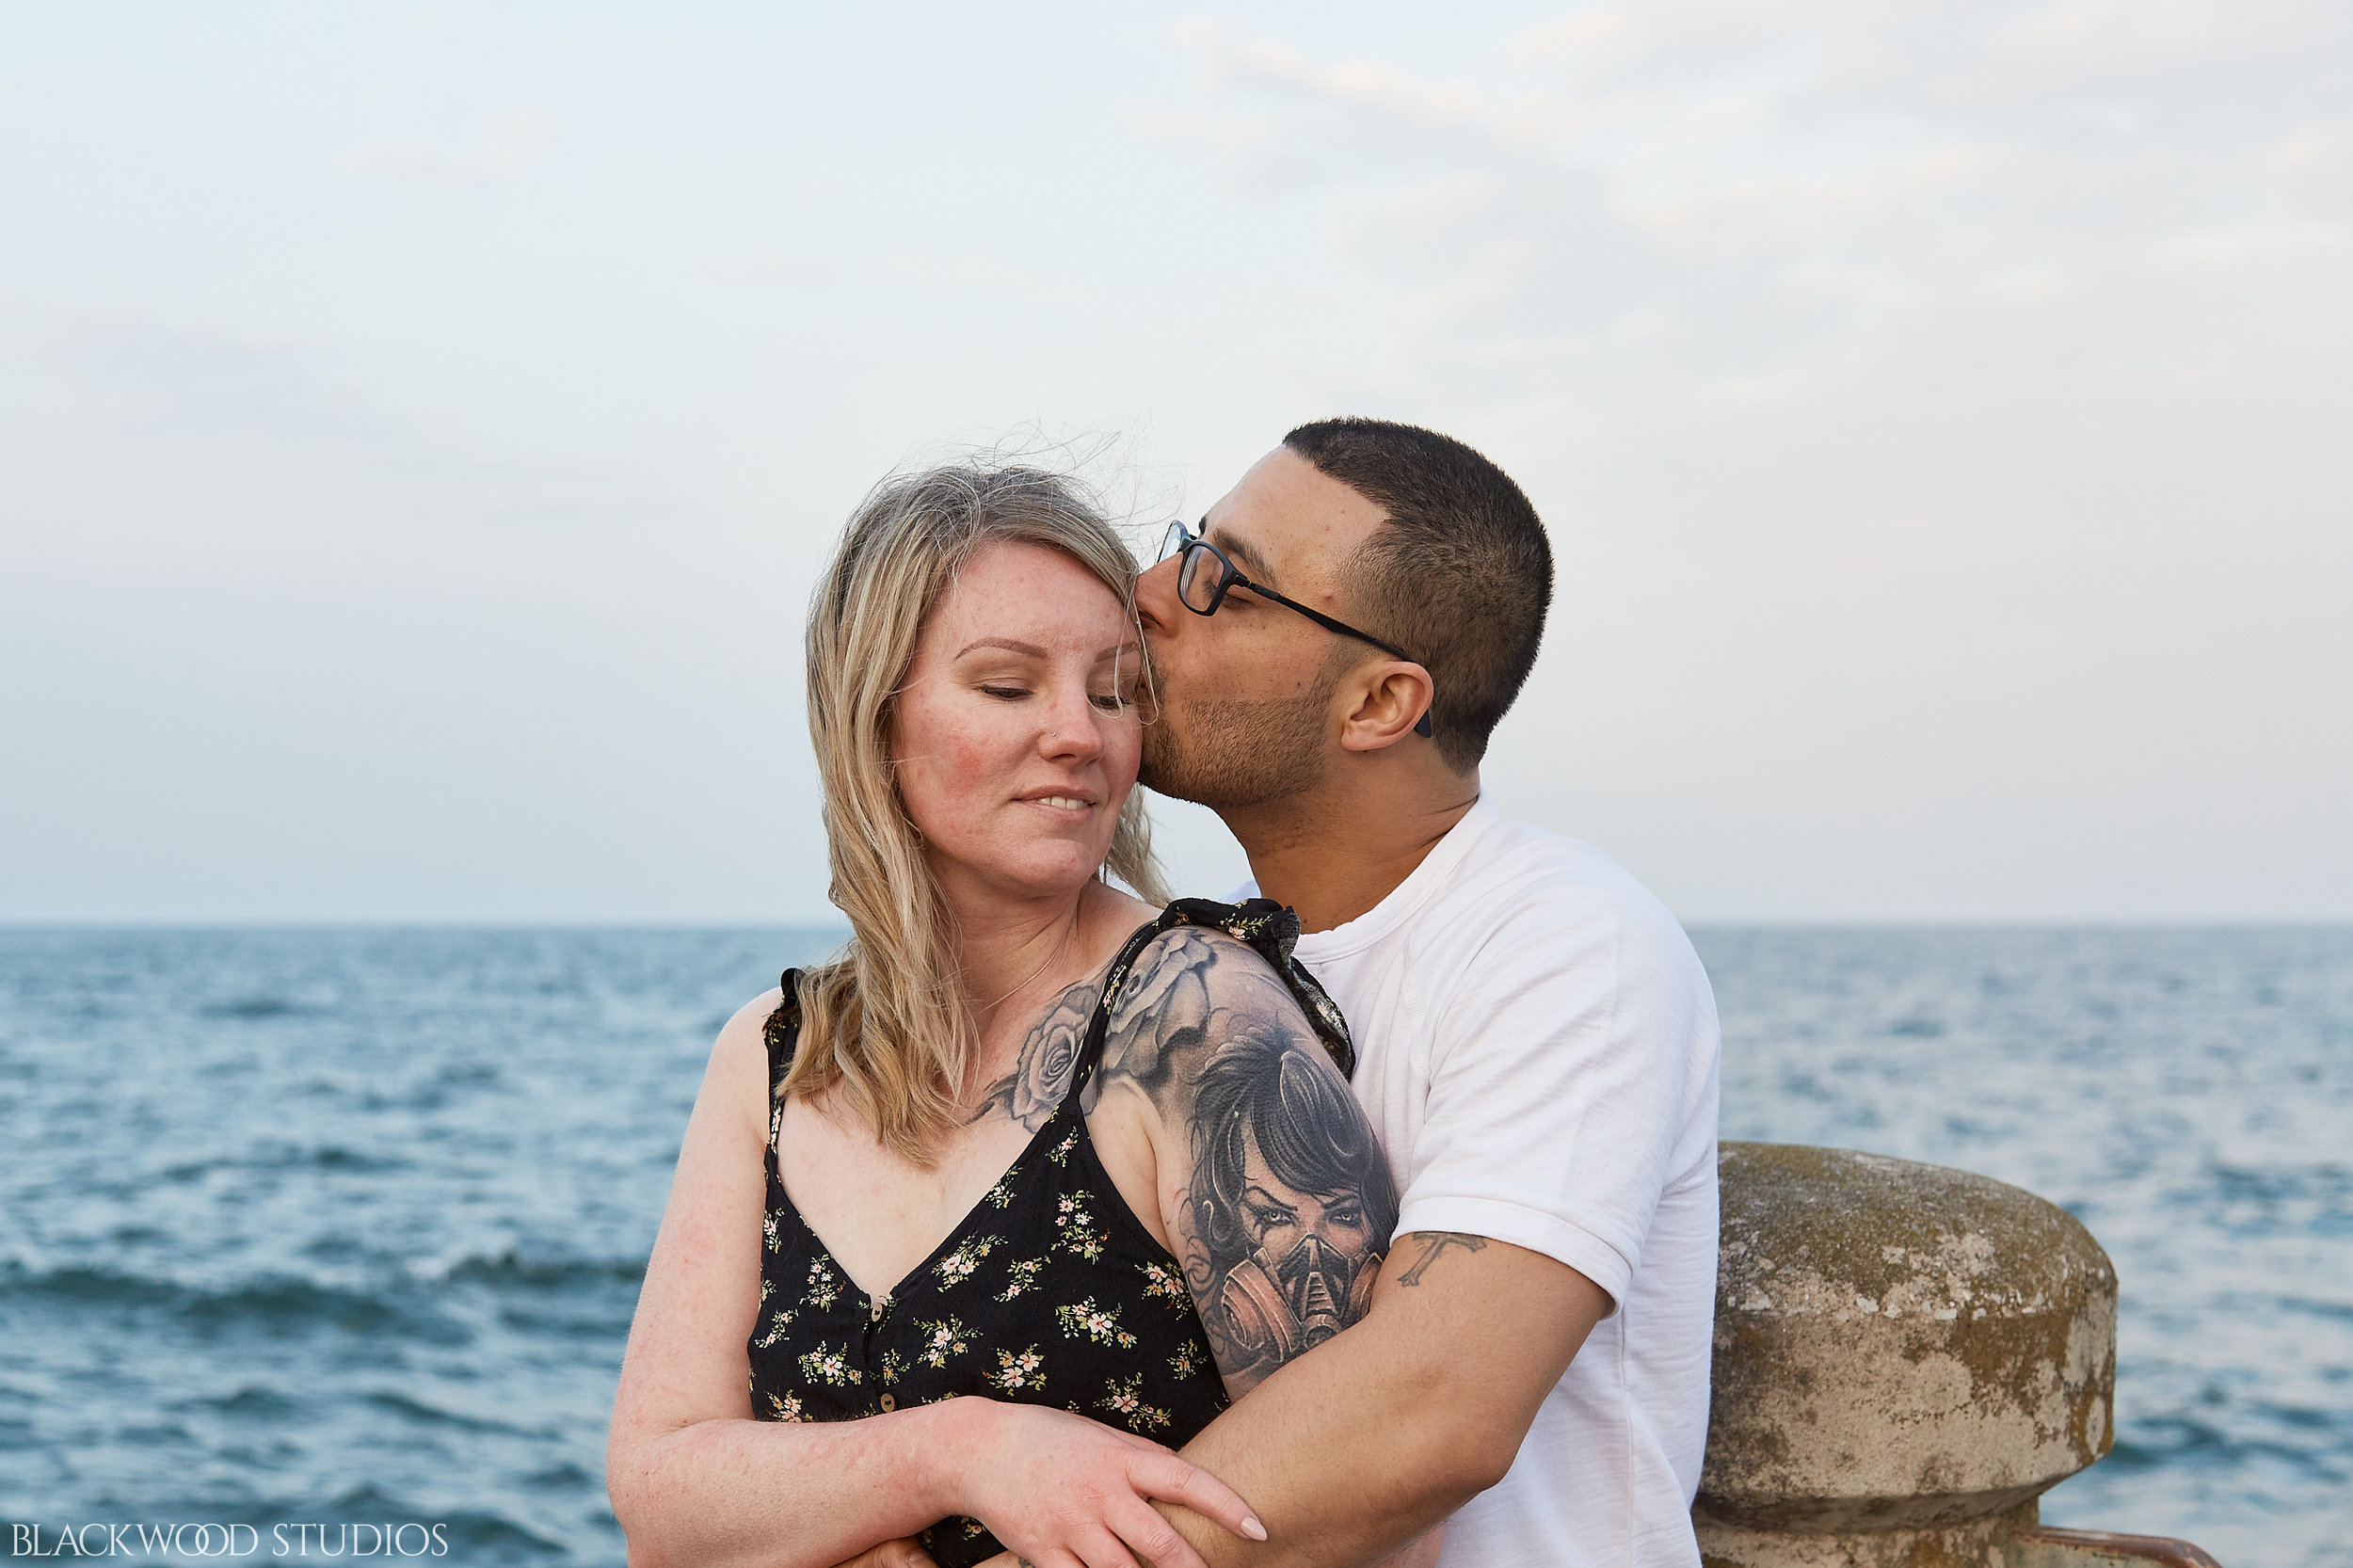 Blackwood-Studios-Photography-20190604202206-Shannon-and-Pedro-Engagement-Spencer-Smith-Park-Burlington-Ontario-Canada.jpg